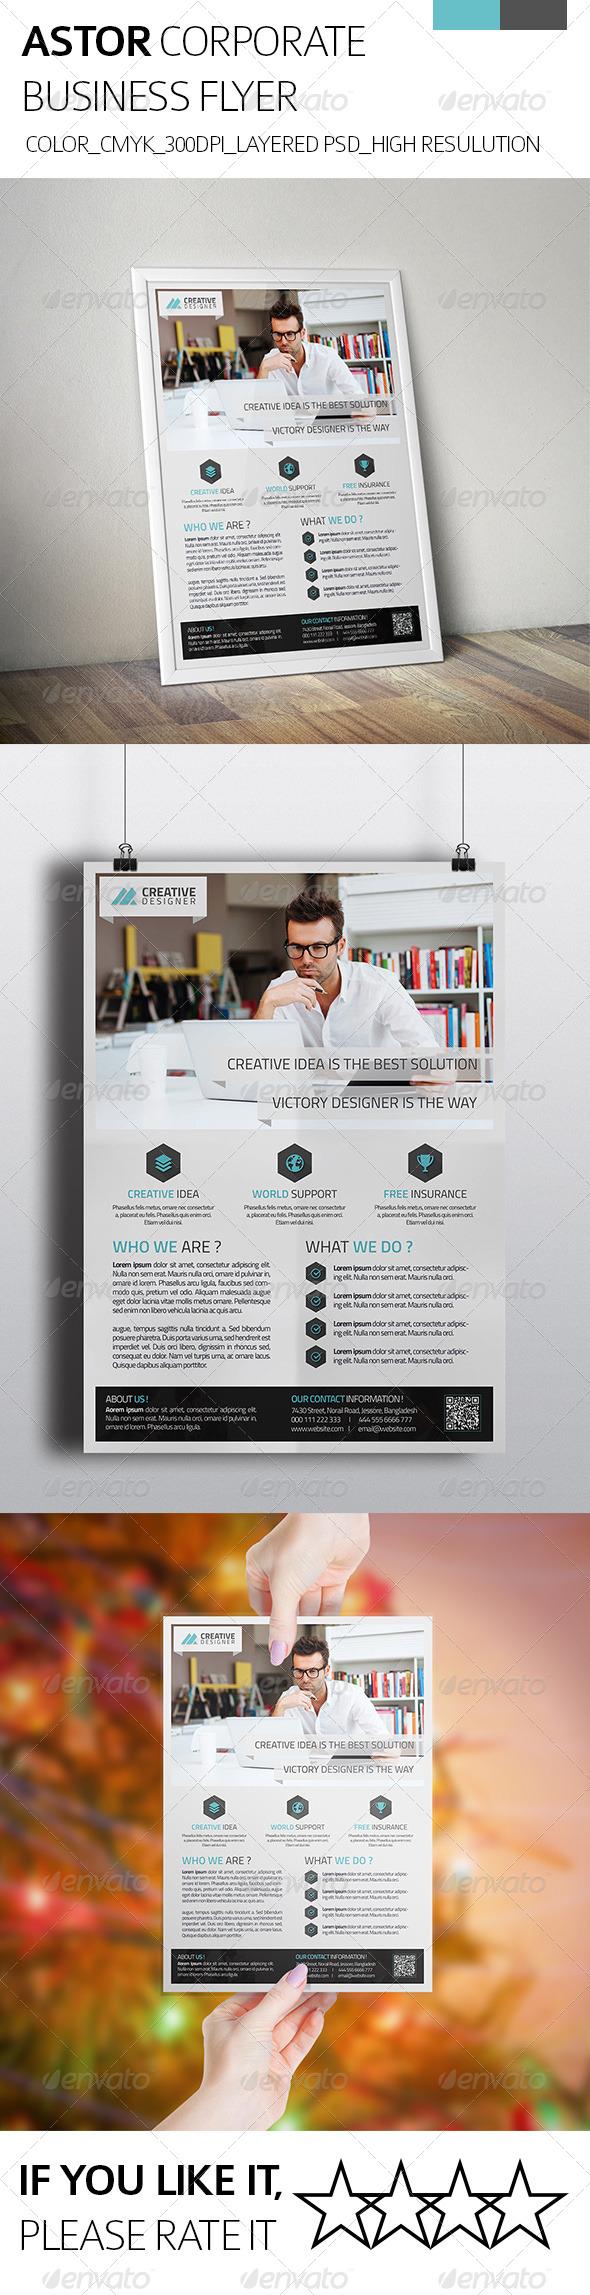 Astor Corporate Business Flyer